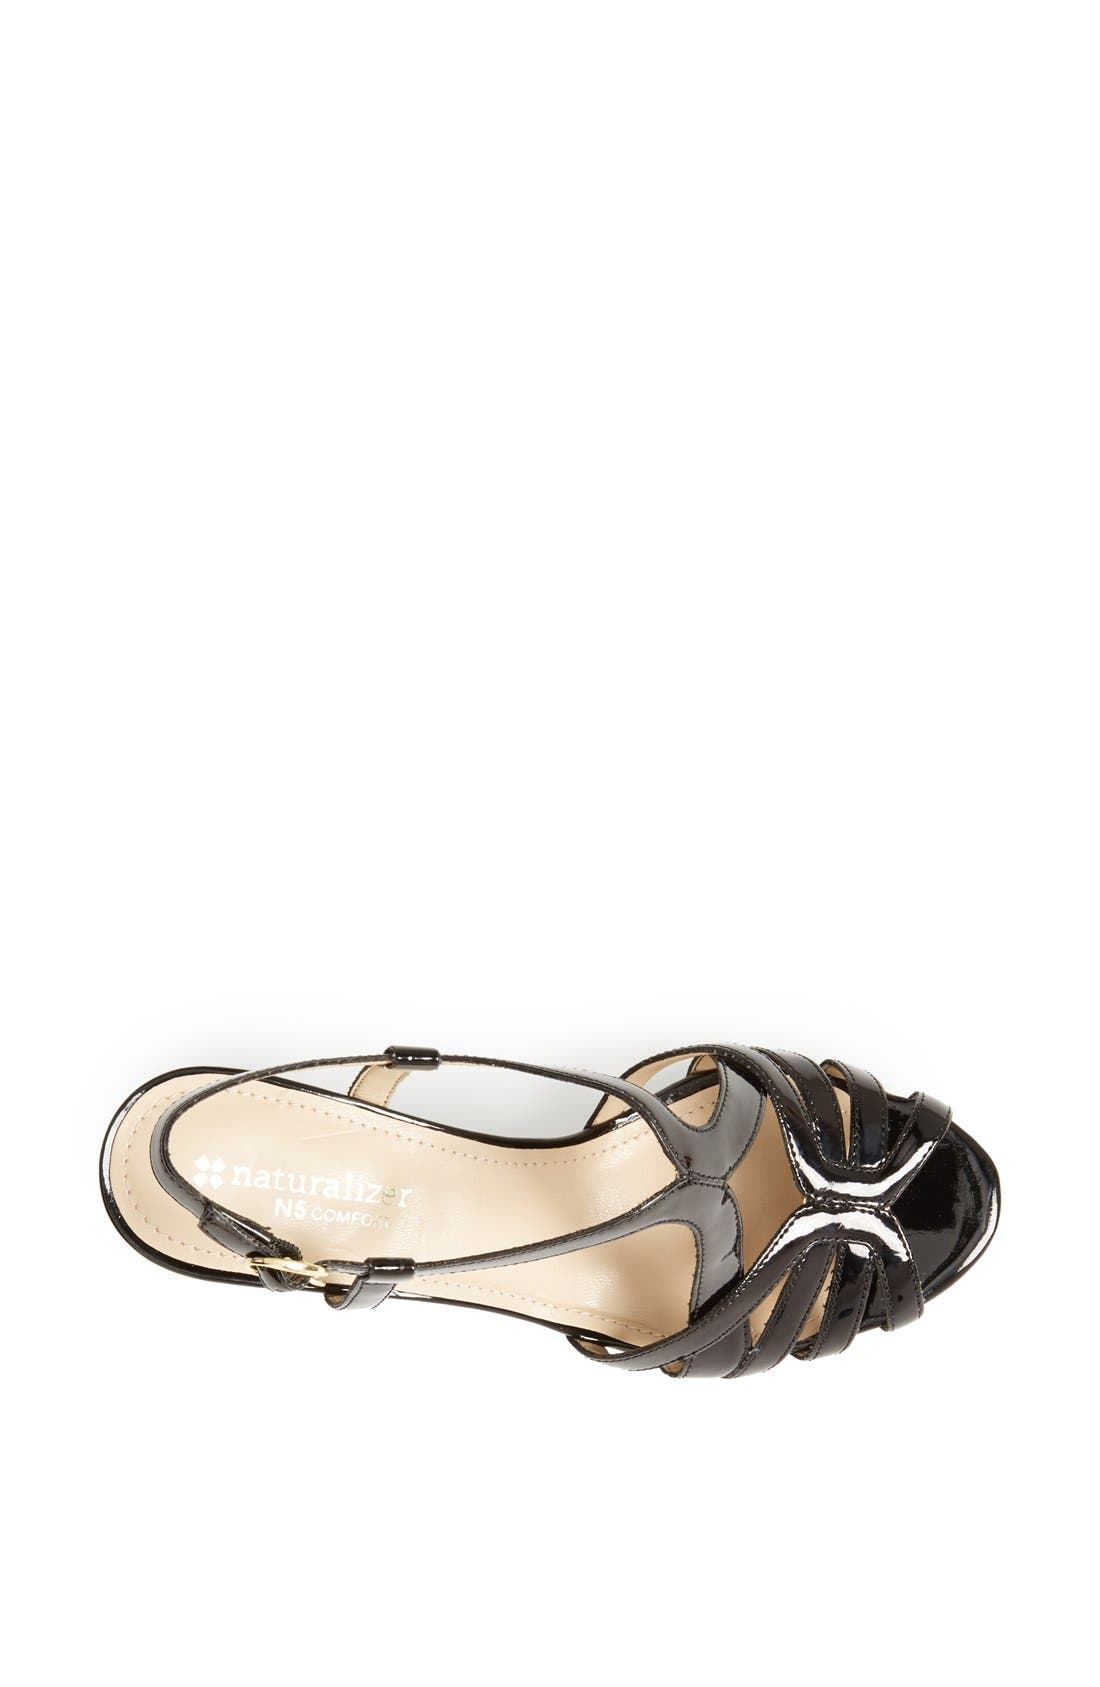 Alternate Image 3  - Naturalizer 'Happening' Wedge Sandal